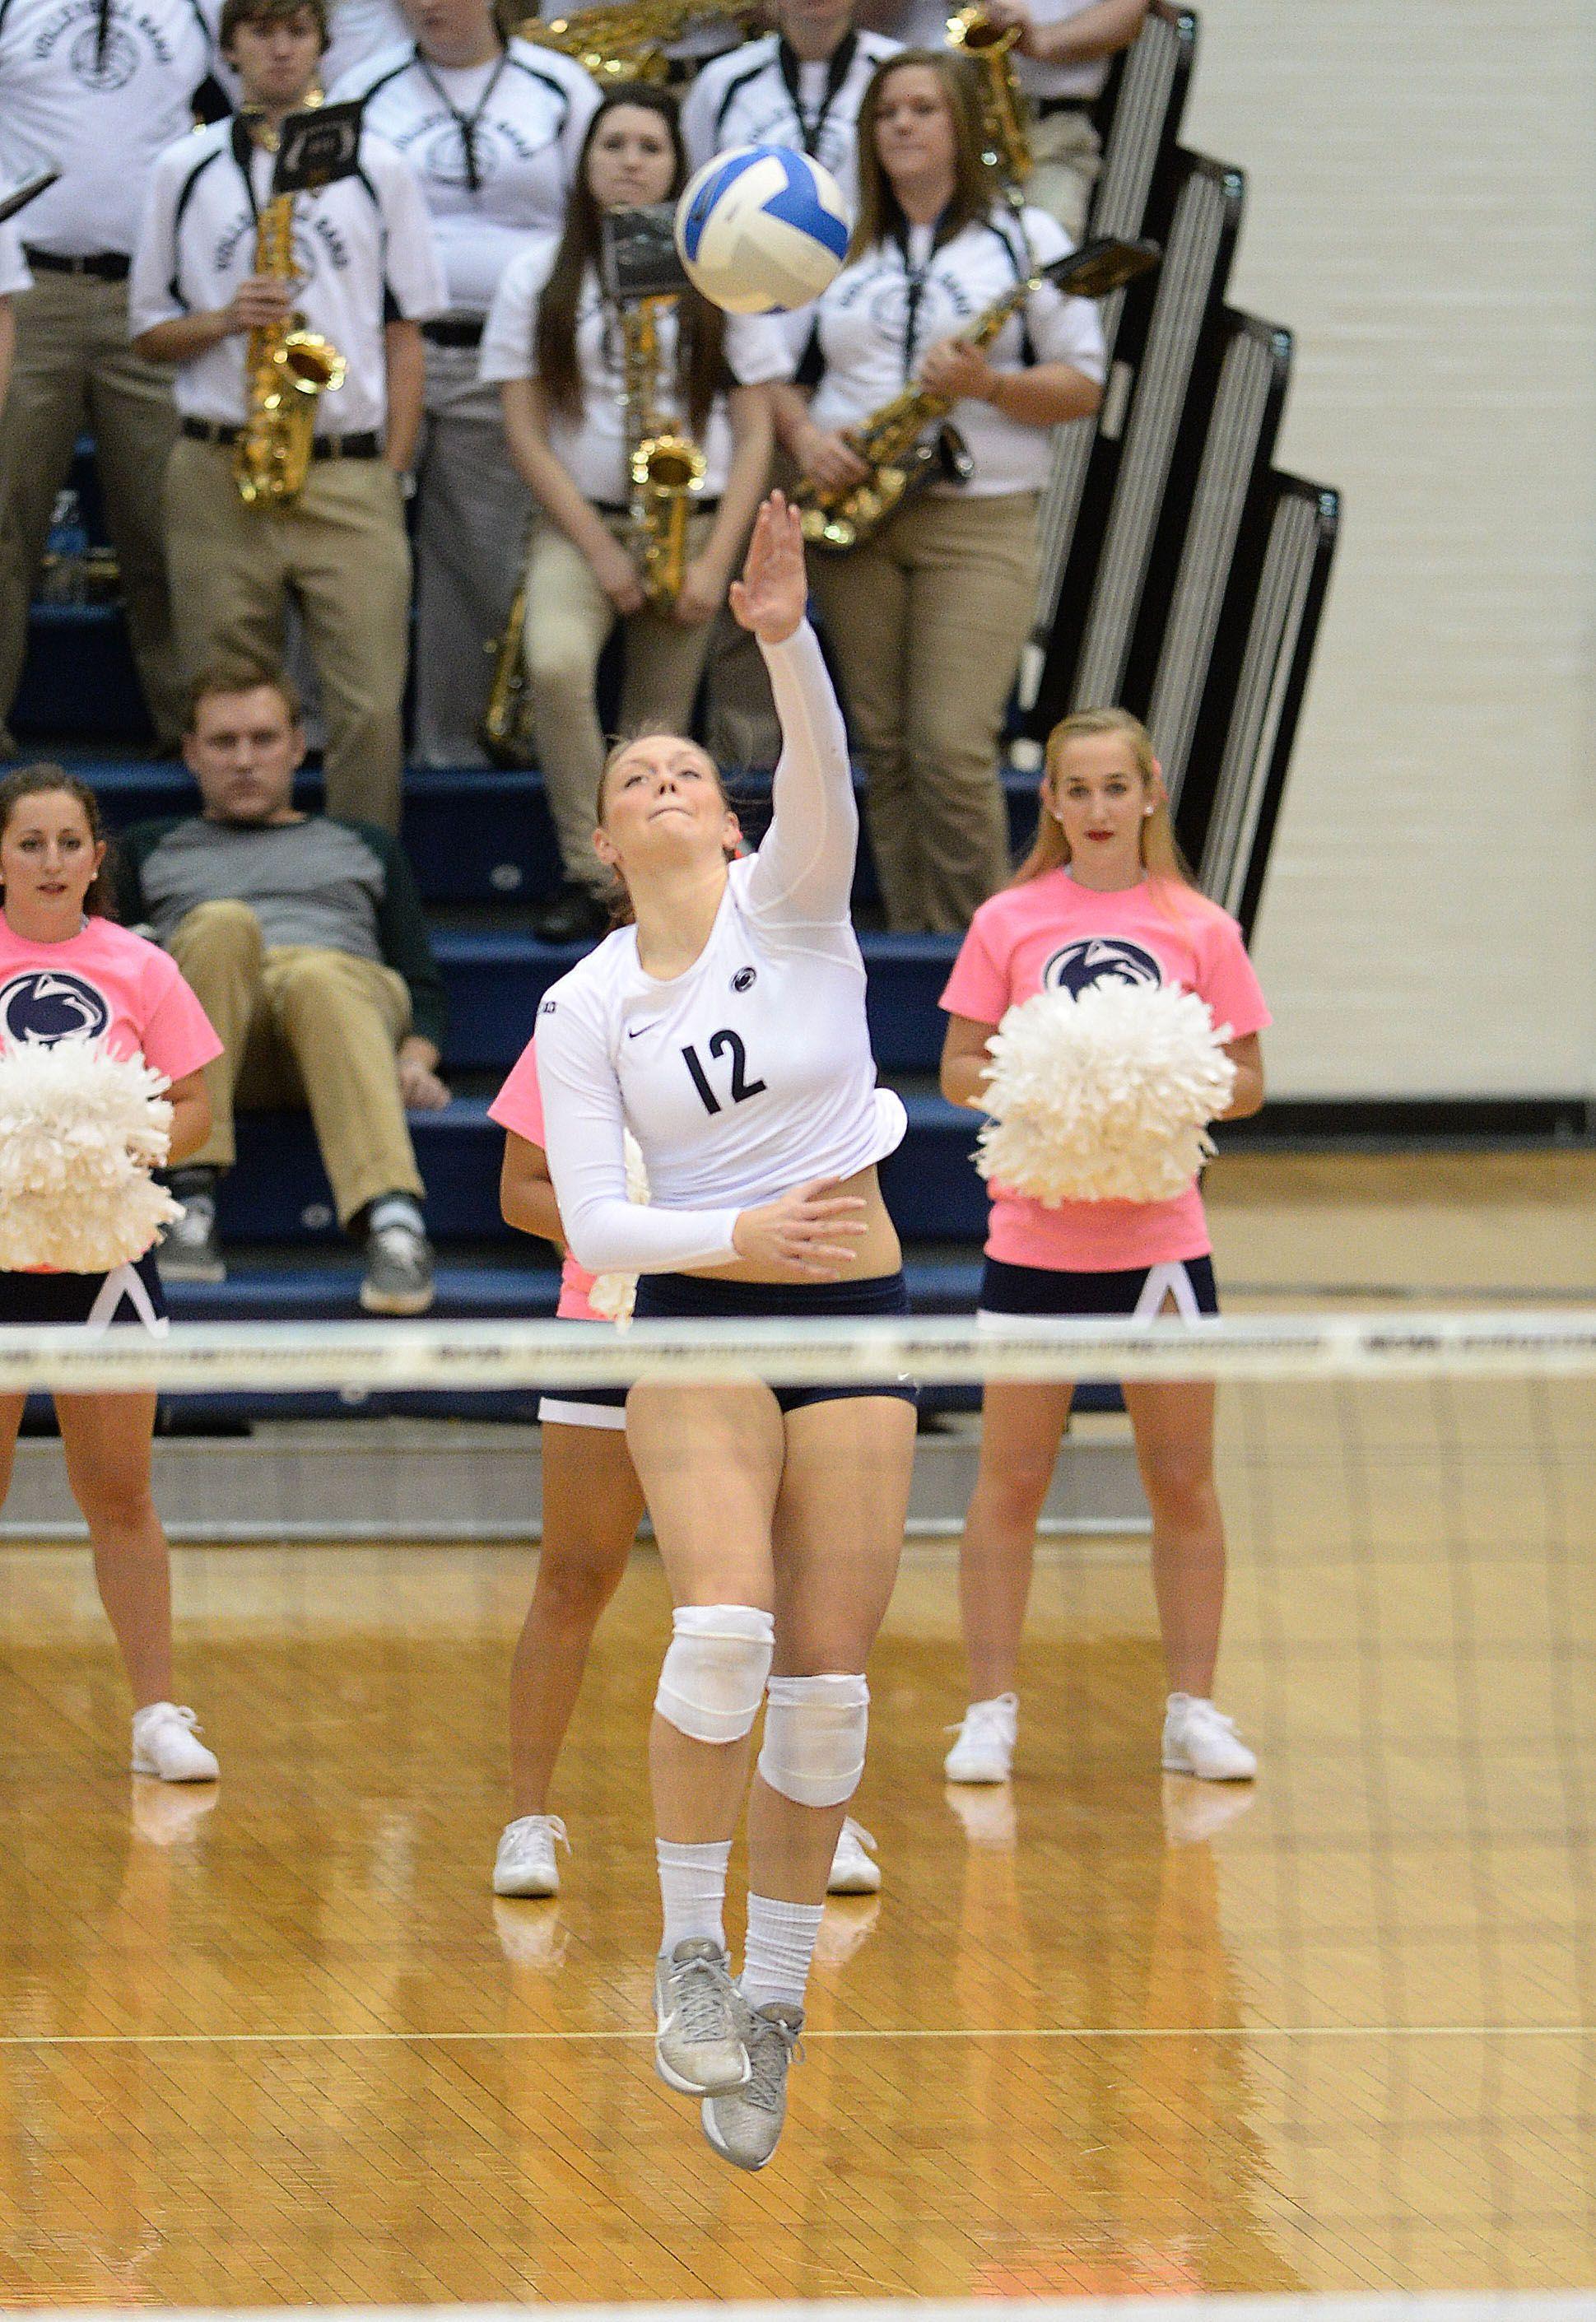 Penn State Athletics Micha Hancock Booms One Of Her Serves Ariel Scott And Katie Slay Block Shot At Net And Penn State Athletics Athlete Volleyball Photos